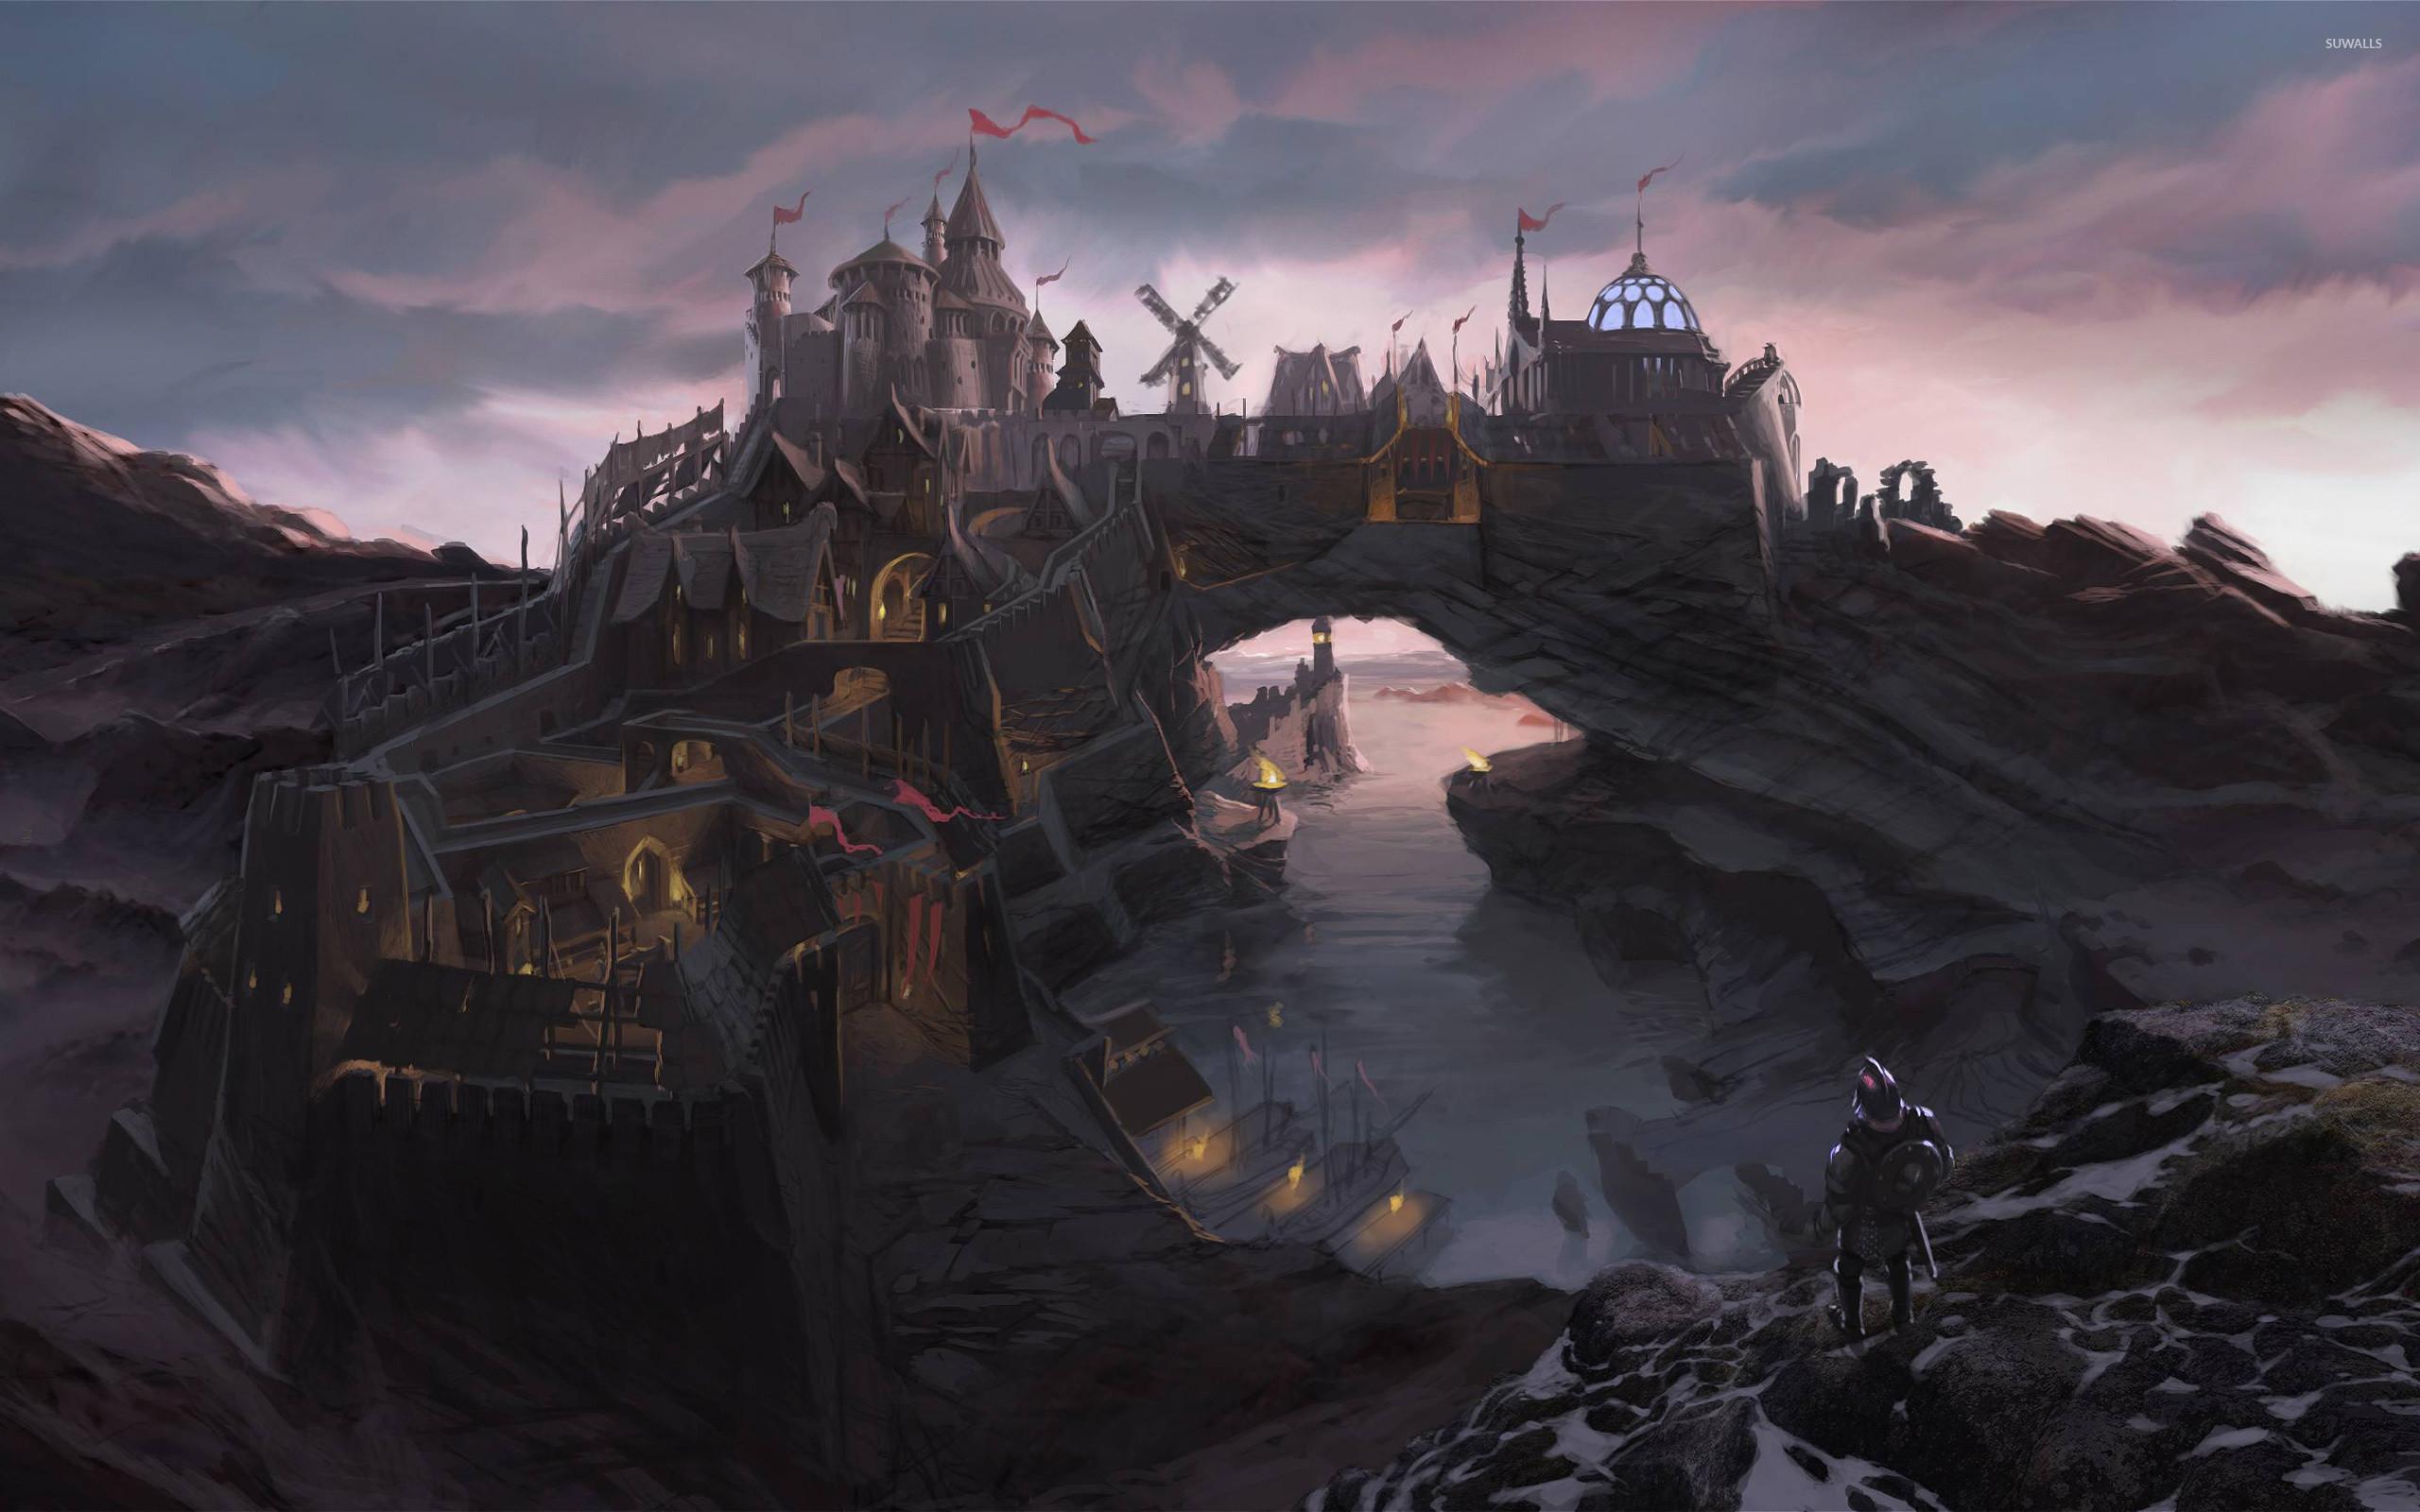 Res: 2560x1600, The Elder Scrolls V: Skyrim [3] wallpaper